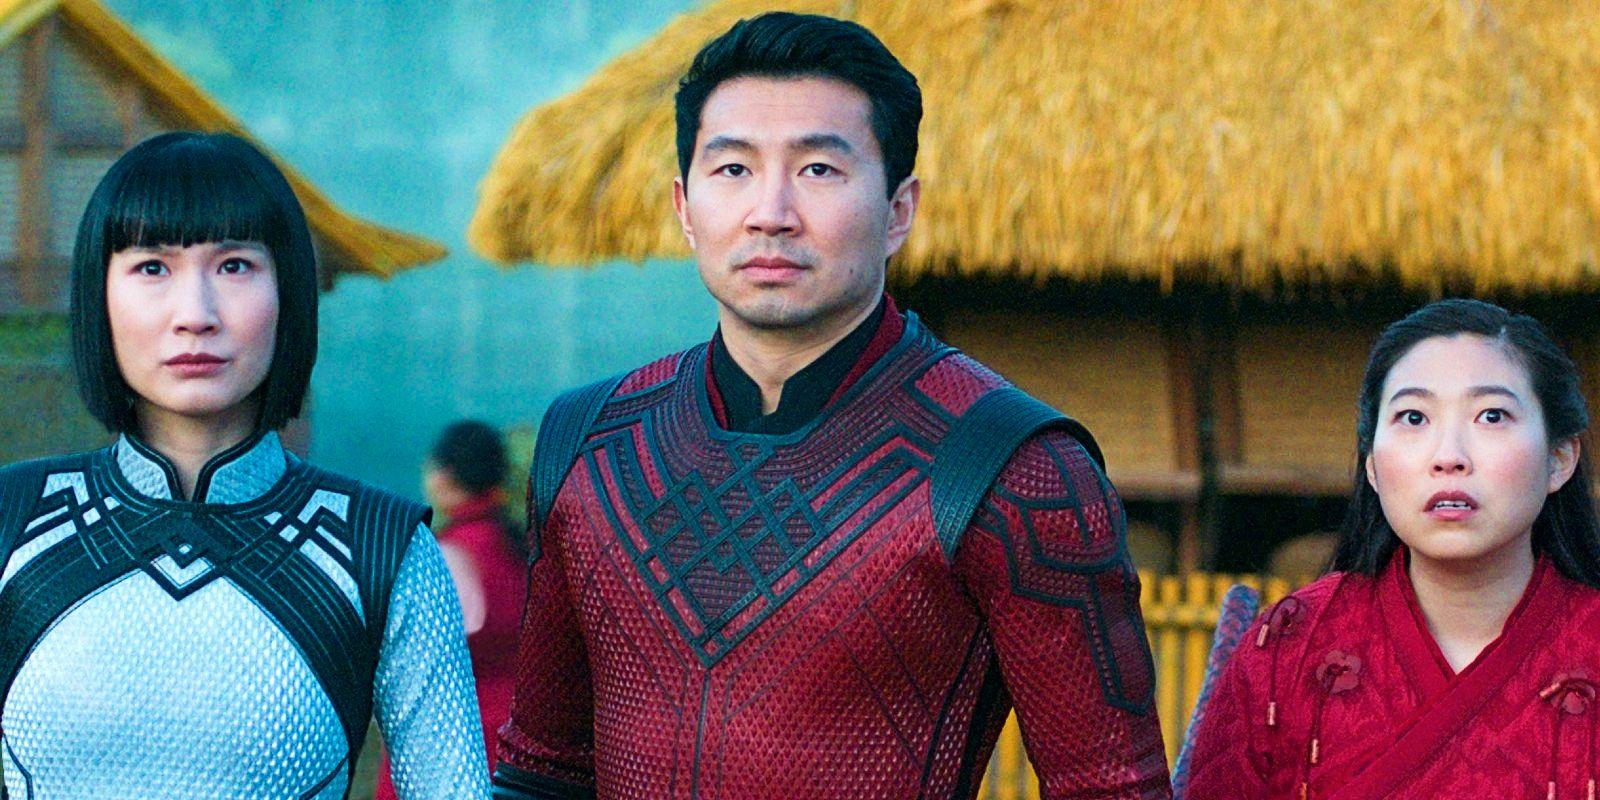 Shang-Chi e a Lenda dos Dez Anéis: novas caras e poderes, a mesma fórmula -  C7nema.net